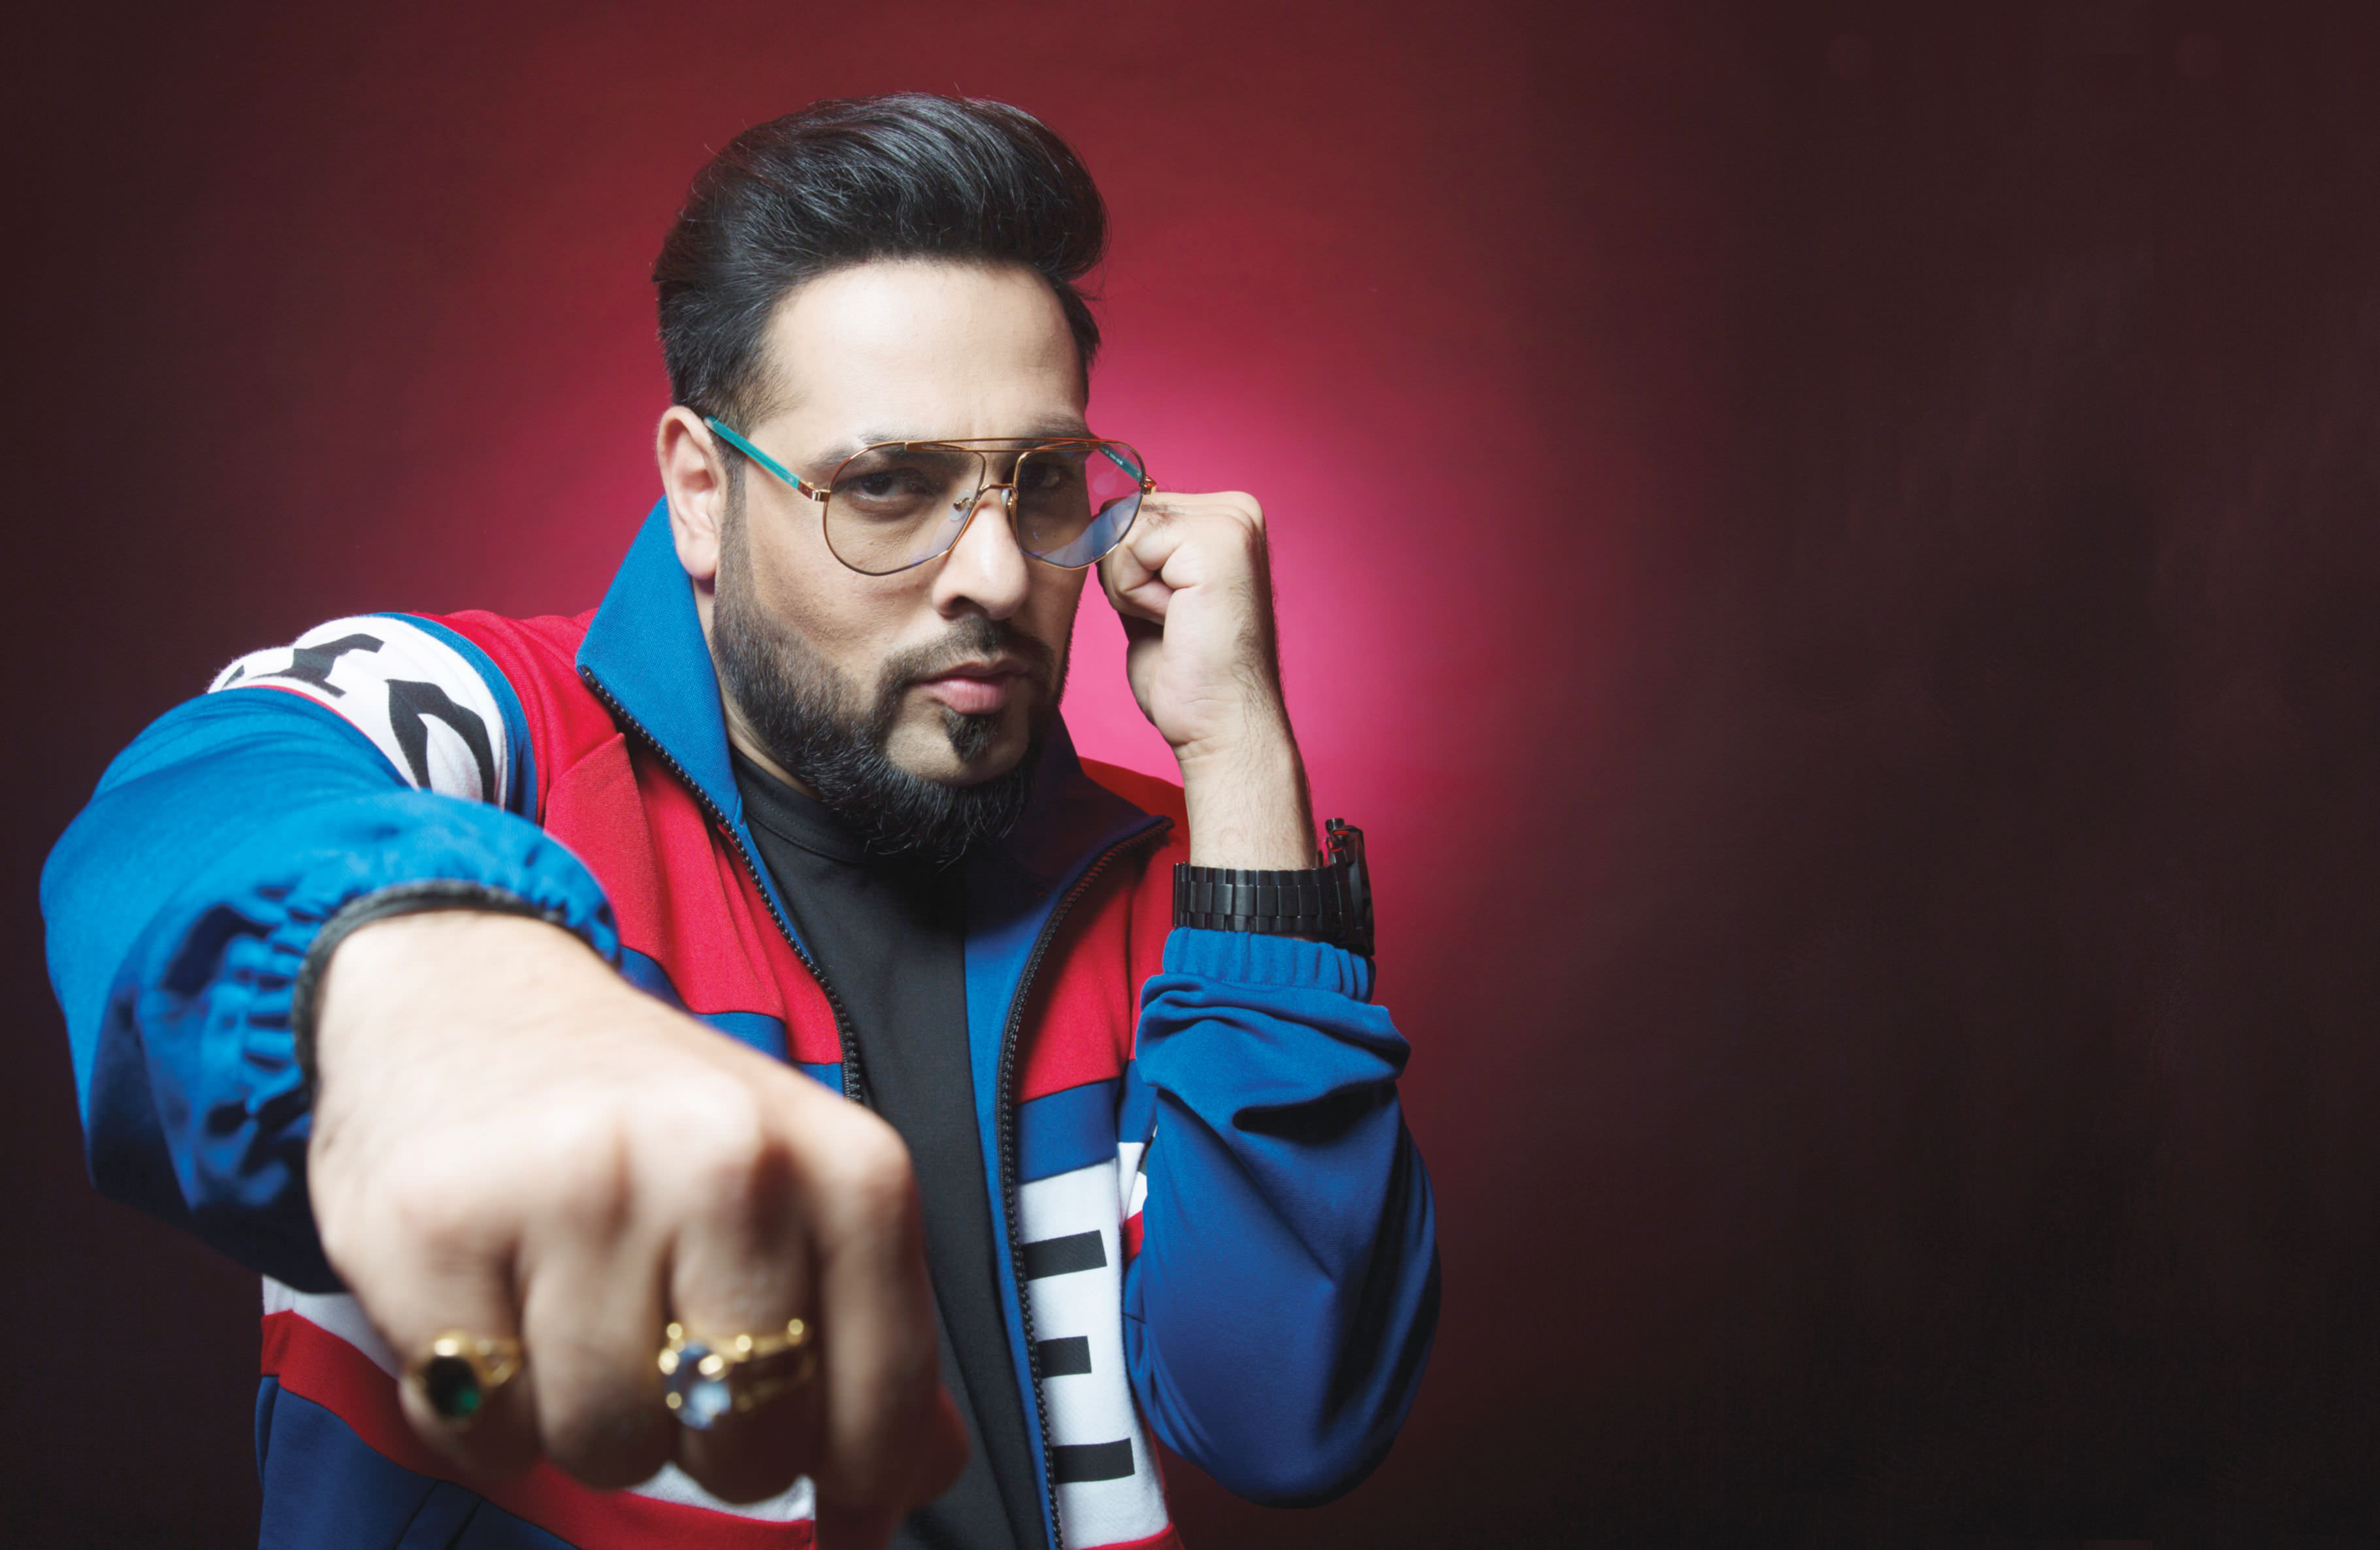 Badshah - The King Of Bollywood Rap Music